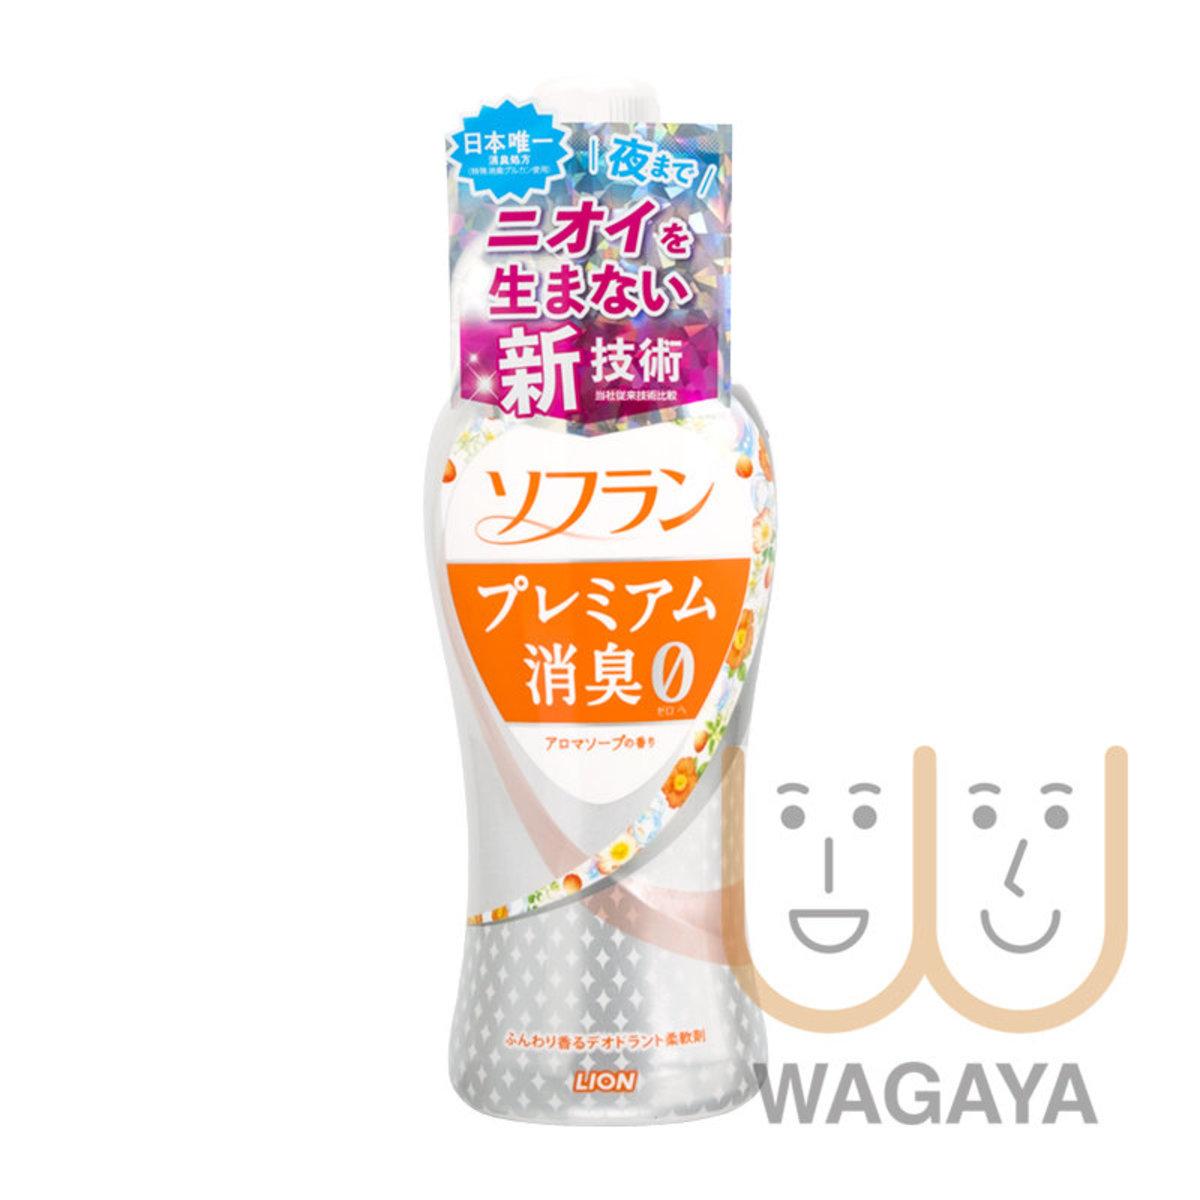 Soflan Premium香薰除臭柔順劑 550ml  (皂香 - 橙色)  (平行進口貨品)